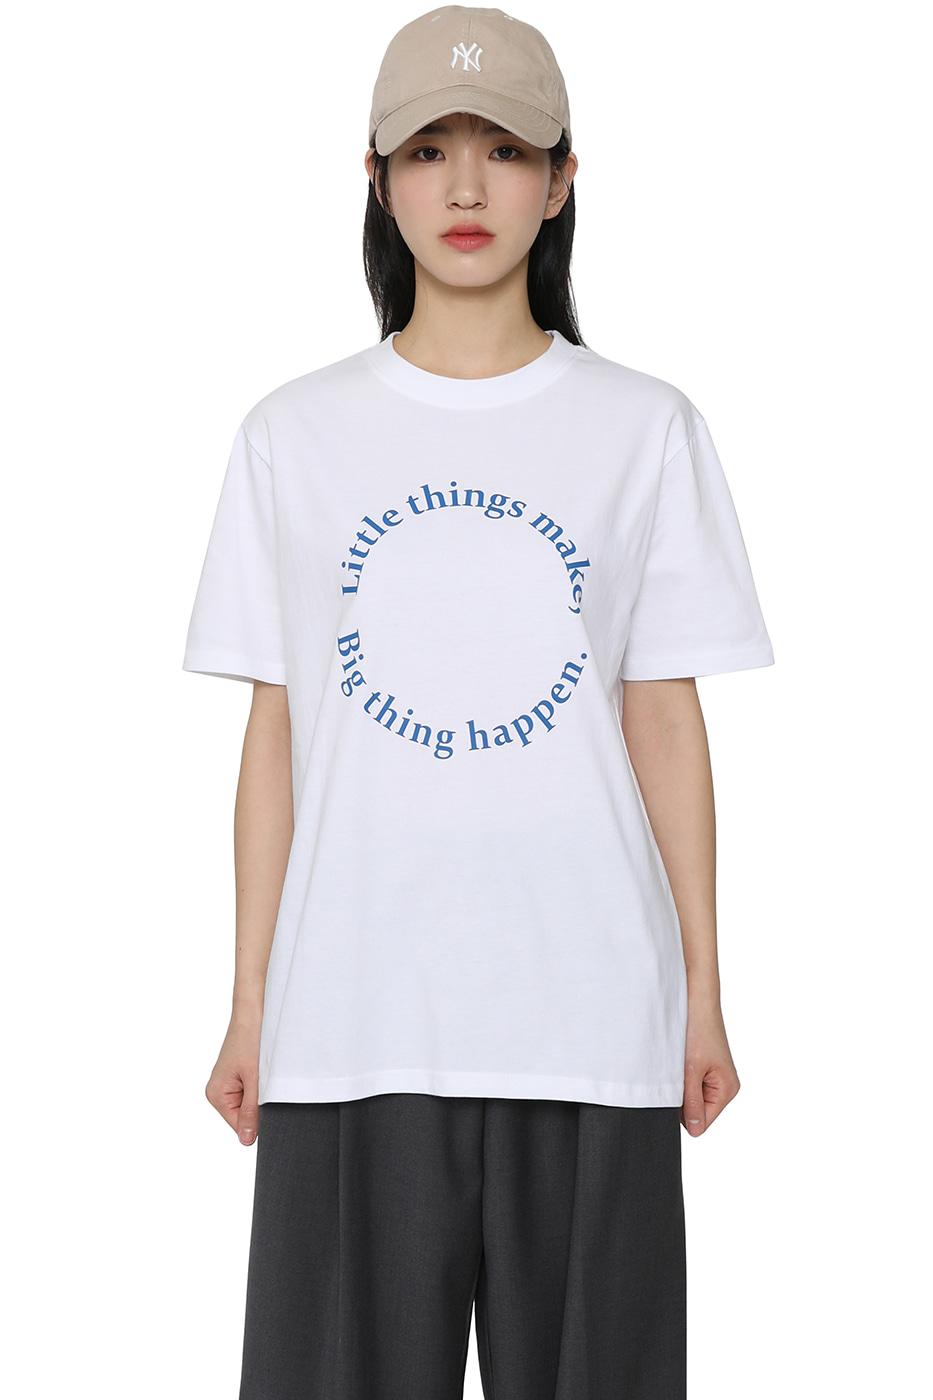 Happy short sleeve T-shirt